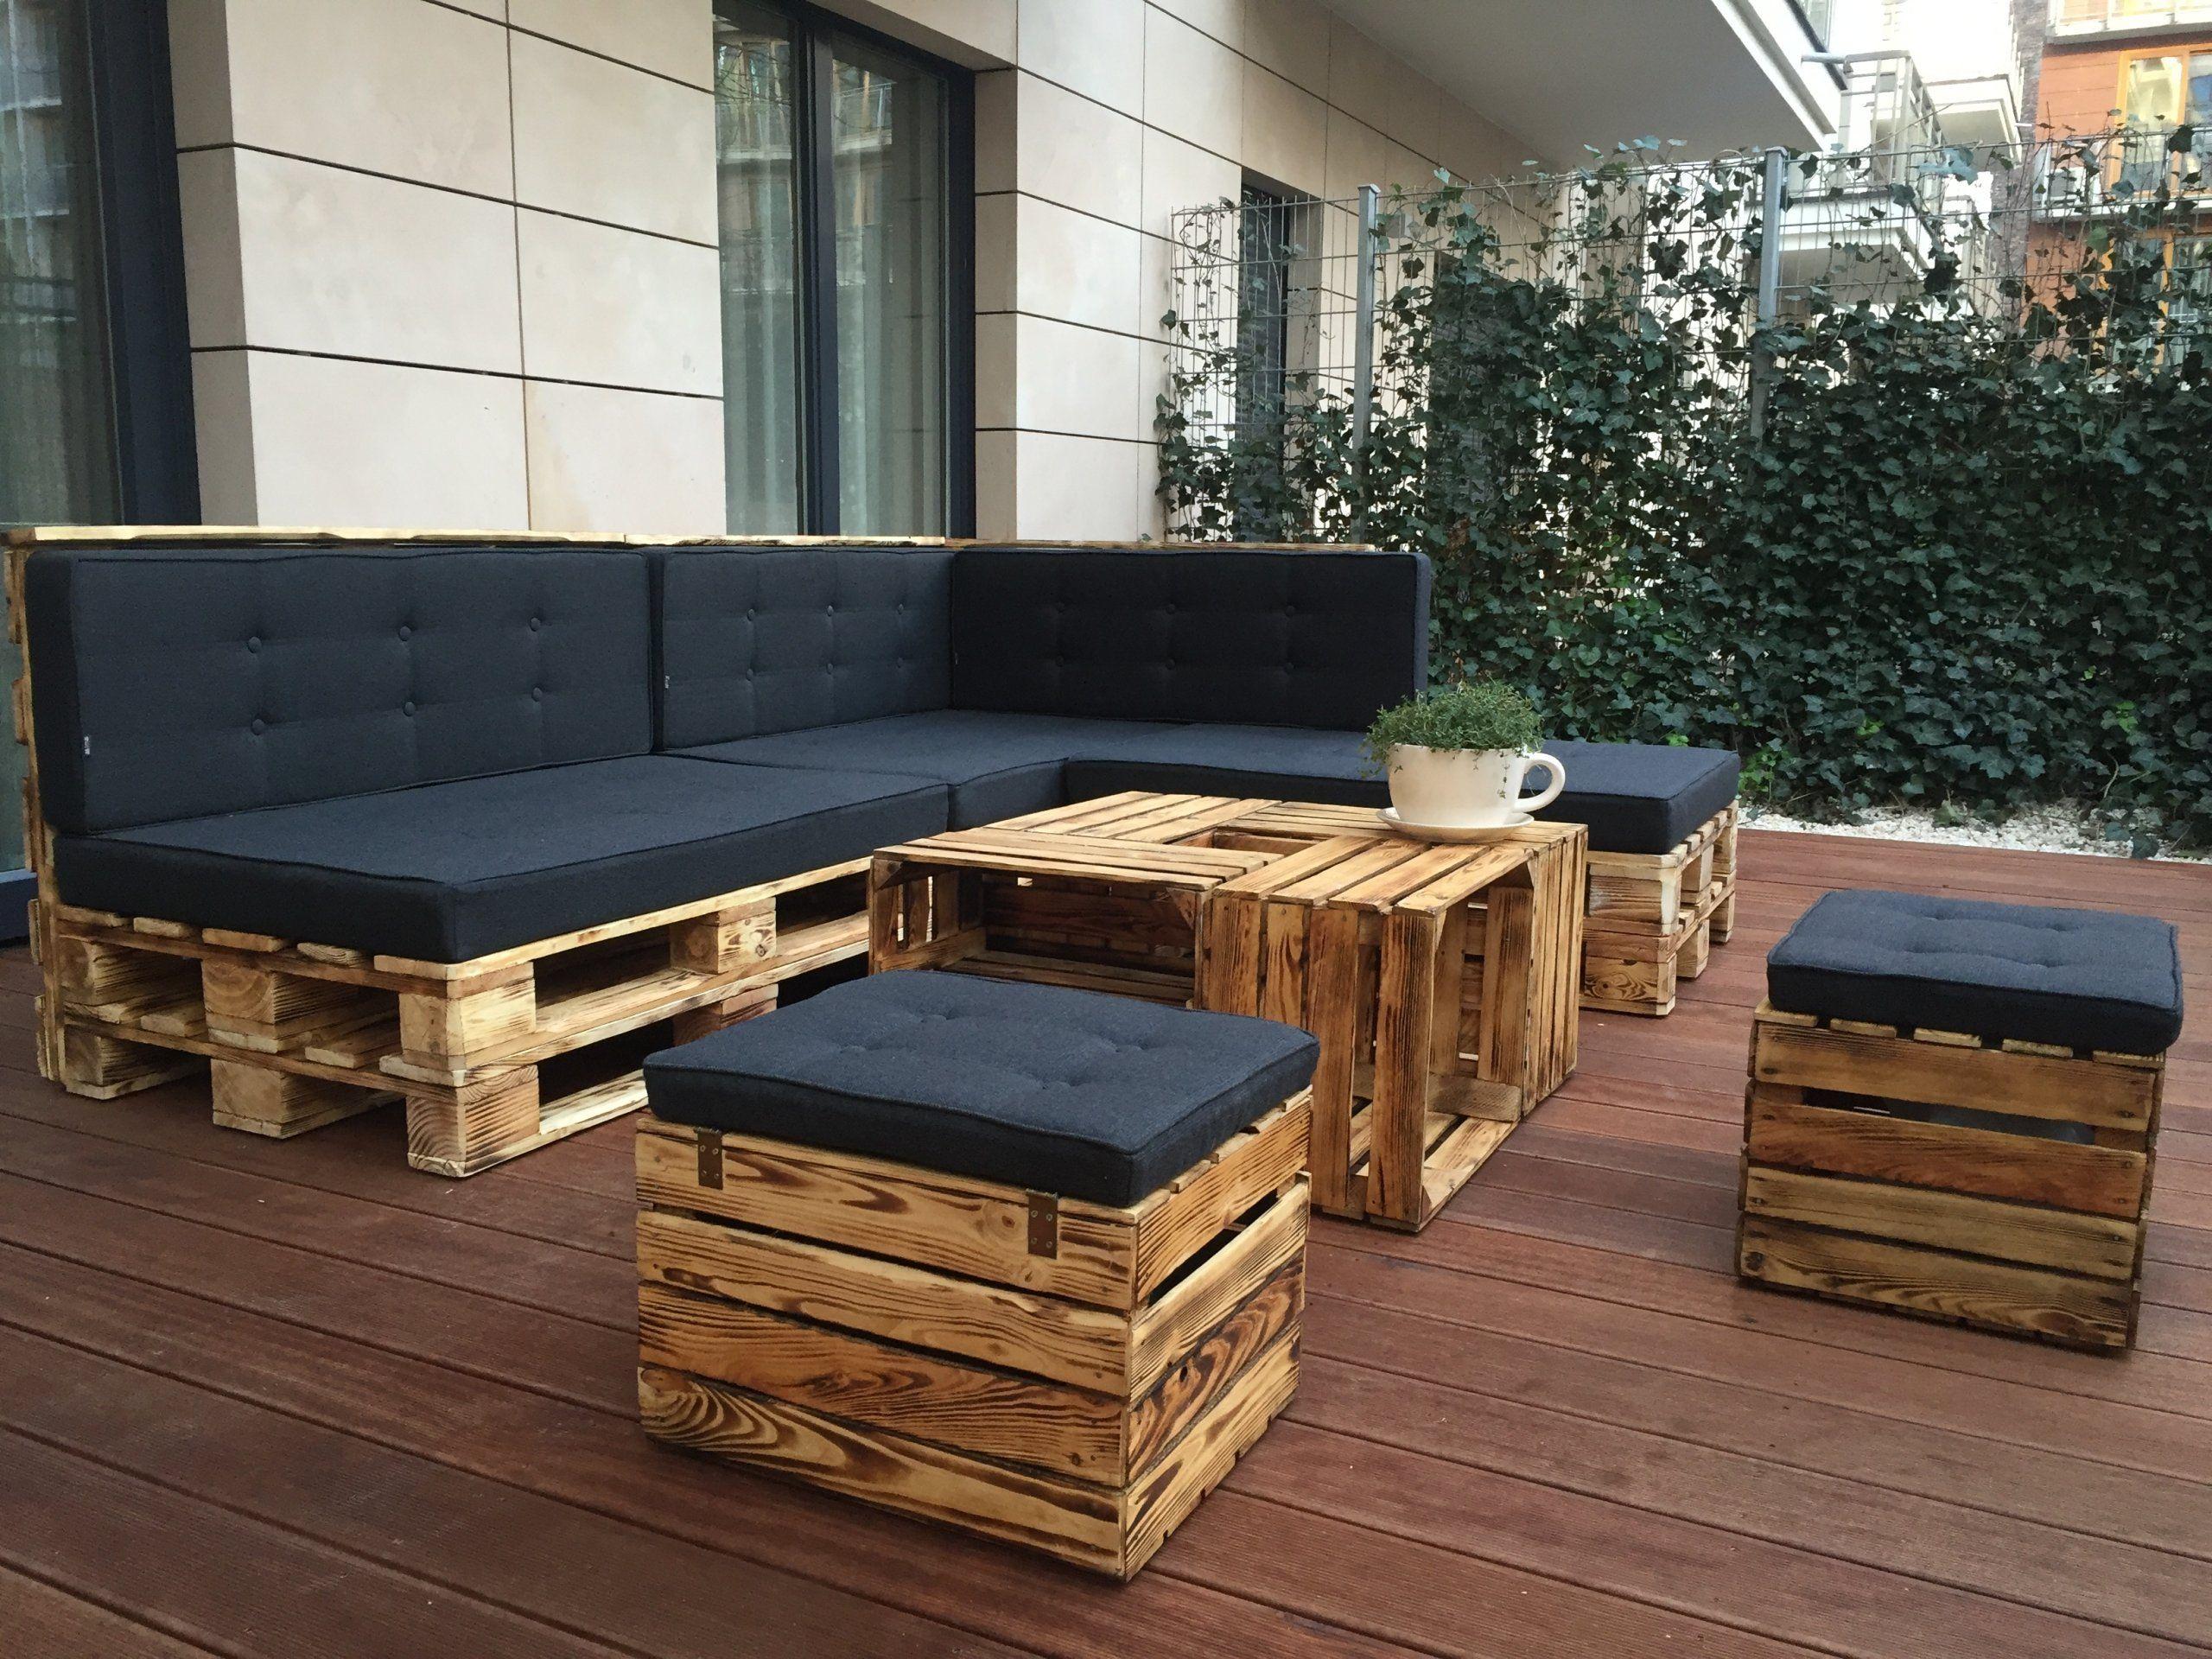 Poduszka Poduszki Materac Na Meble Z Palet Classic Home Furniture Outdoor Furniture Outside Furniture